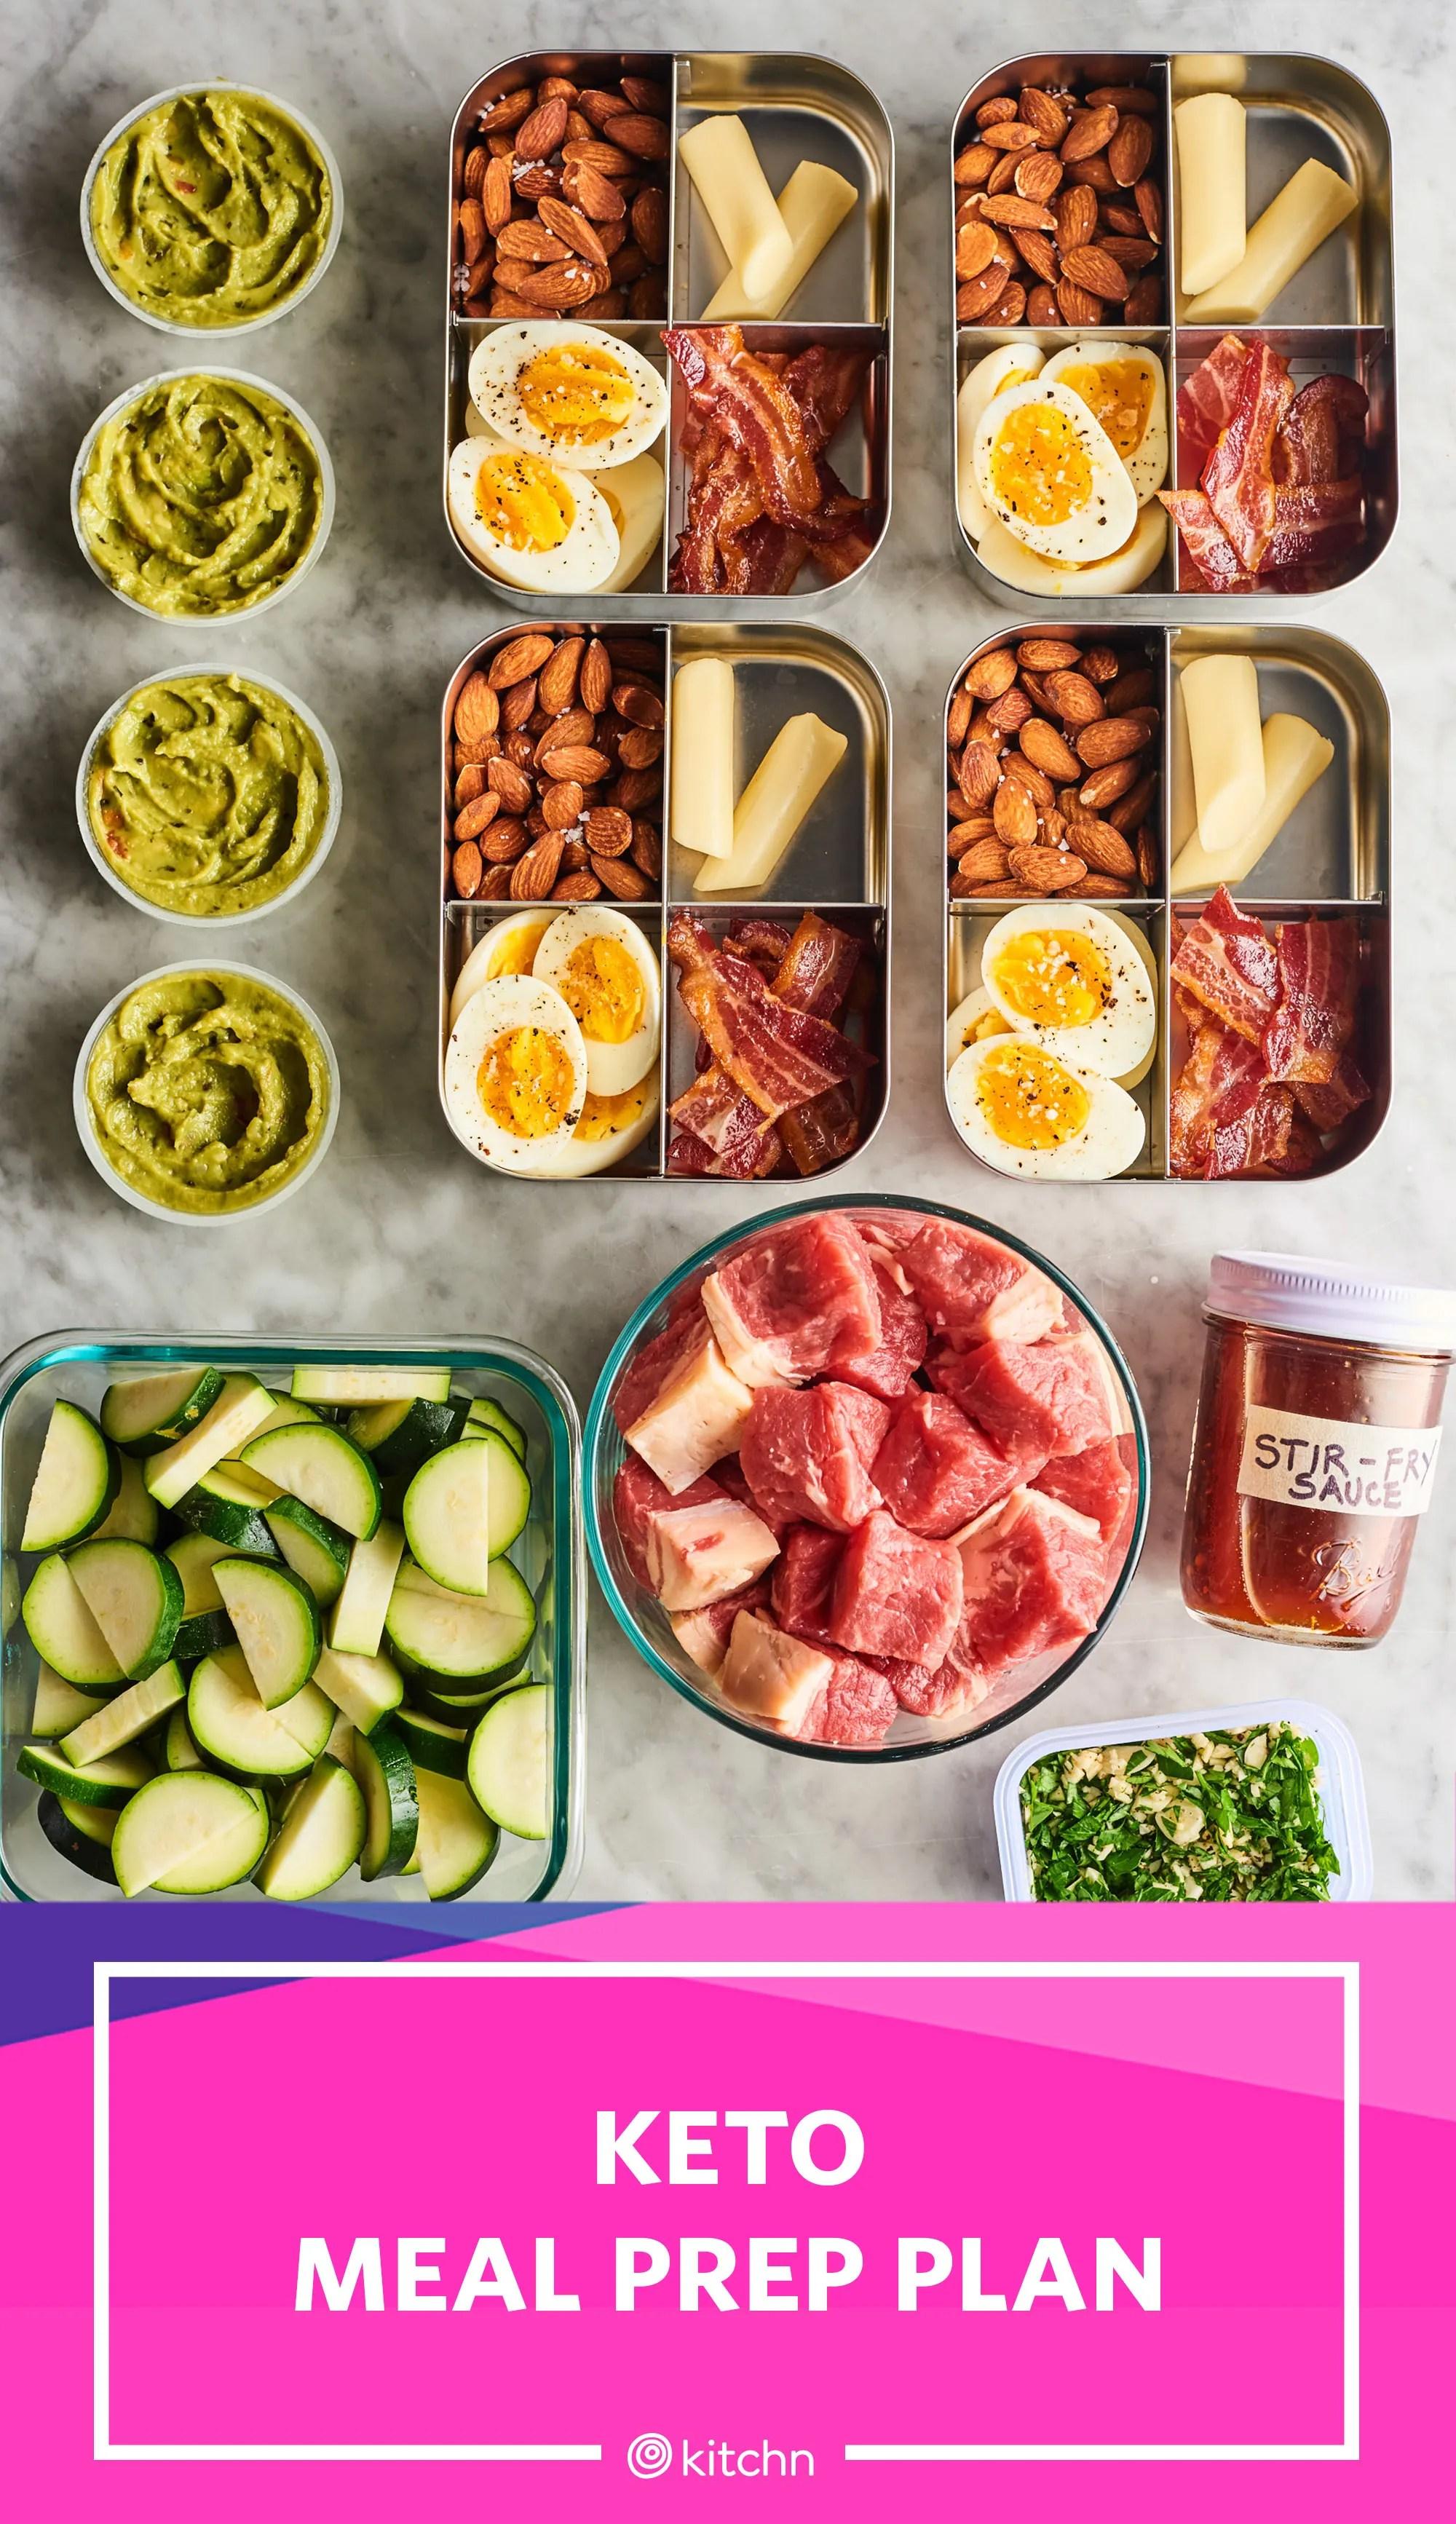 keto meal prep for 1 week of keto meals